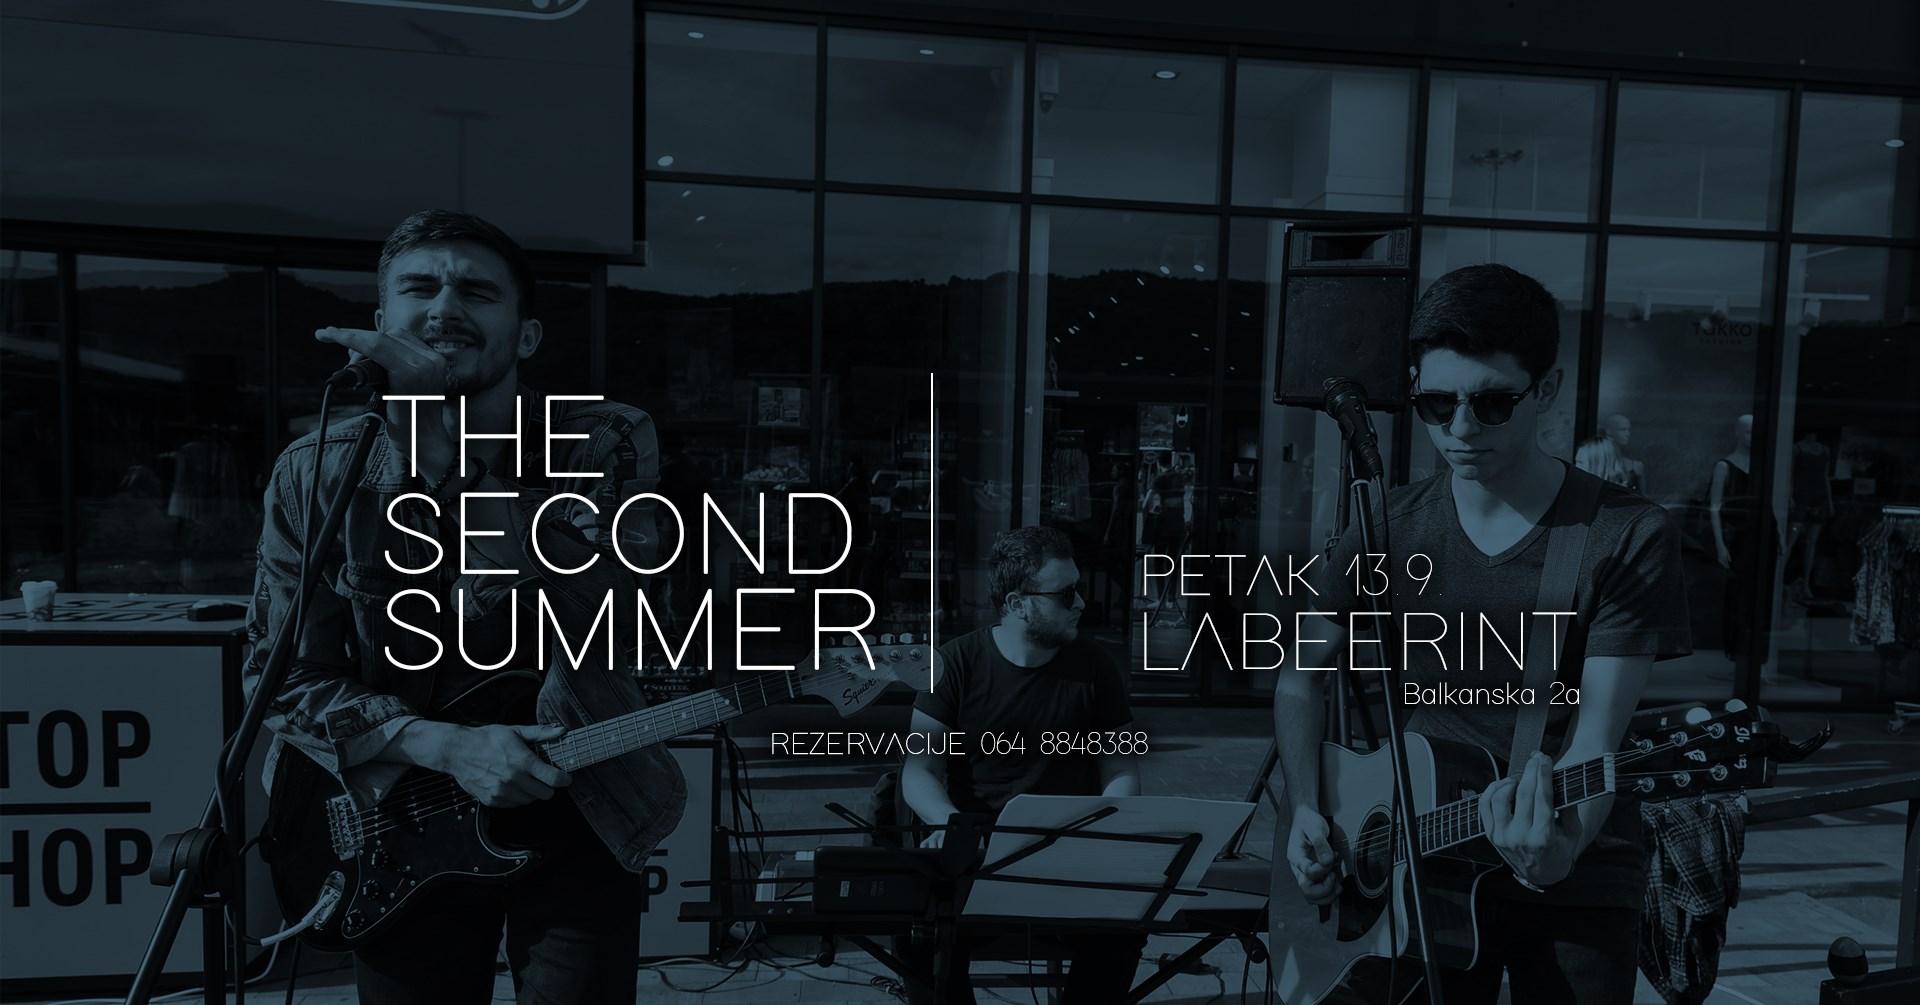 TheSecondSummer - Petak - Labeerint